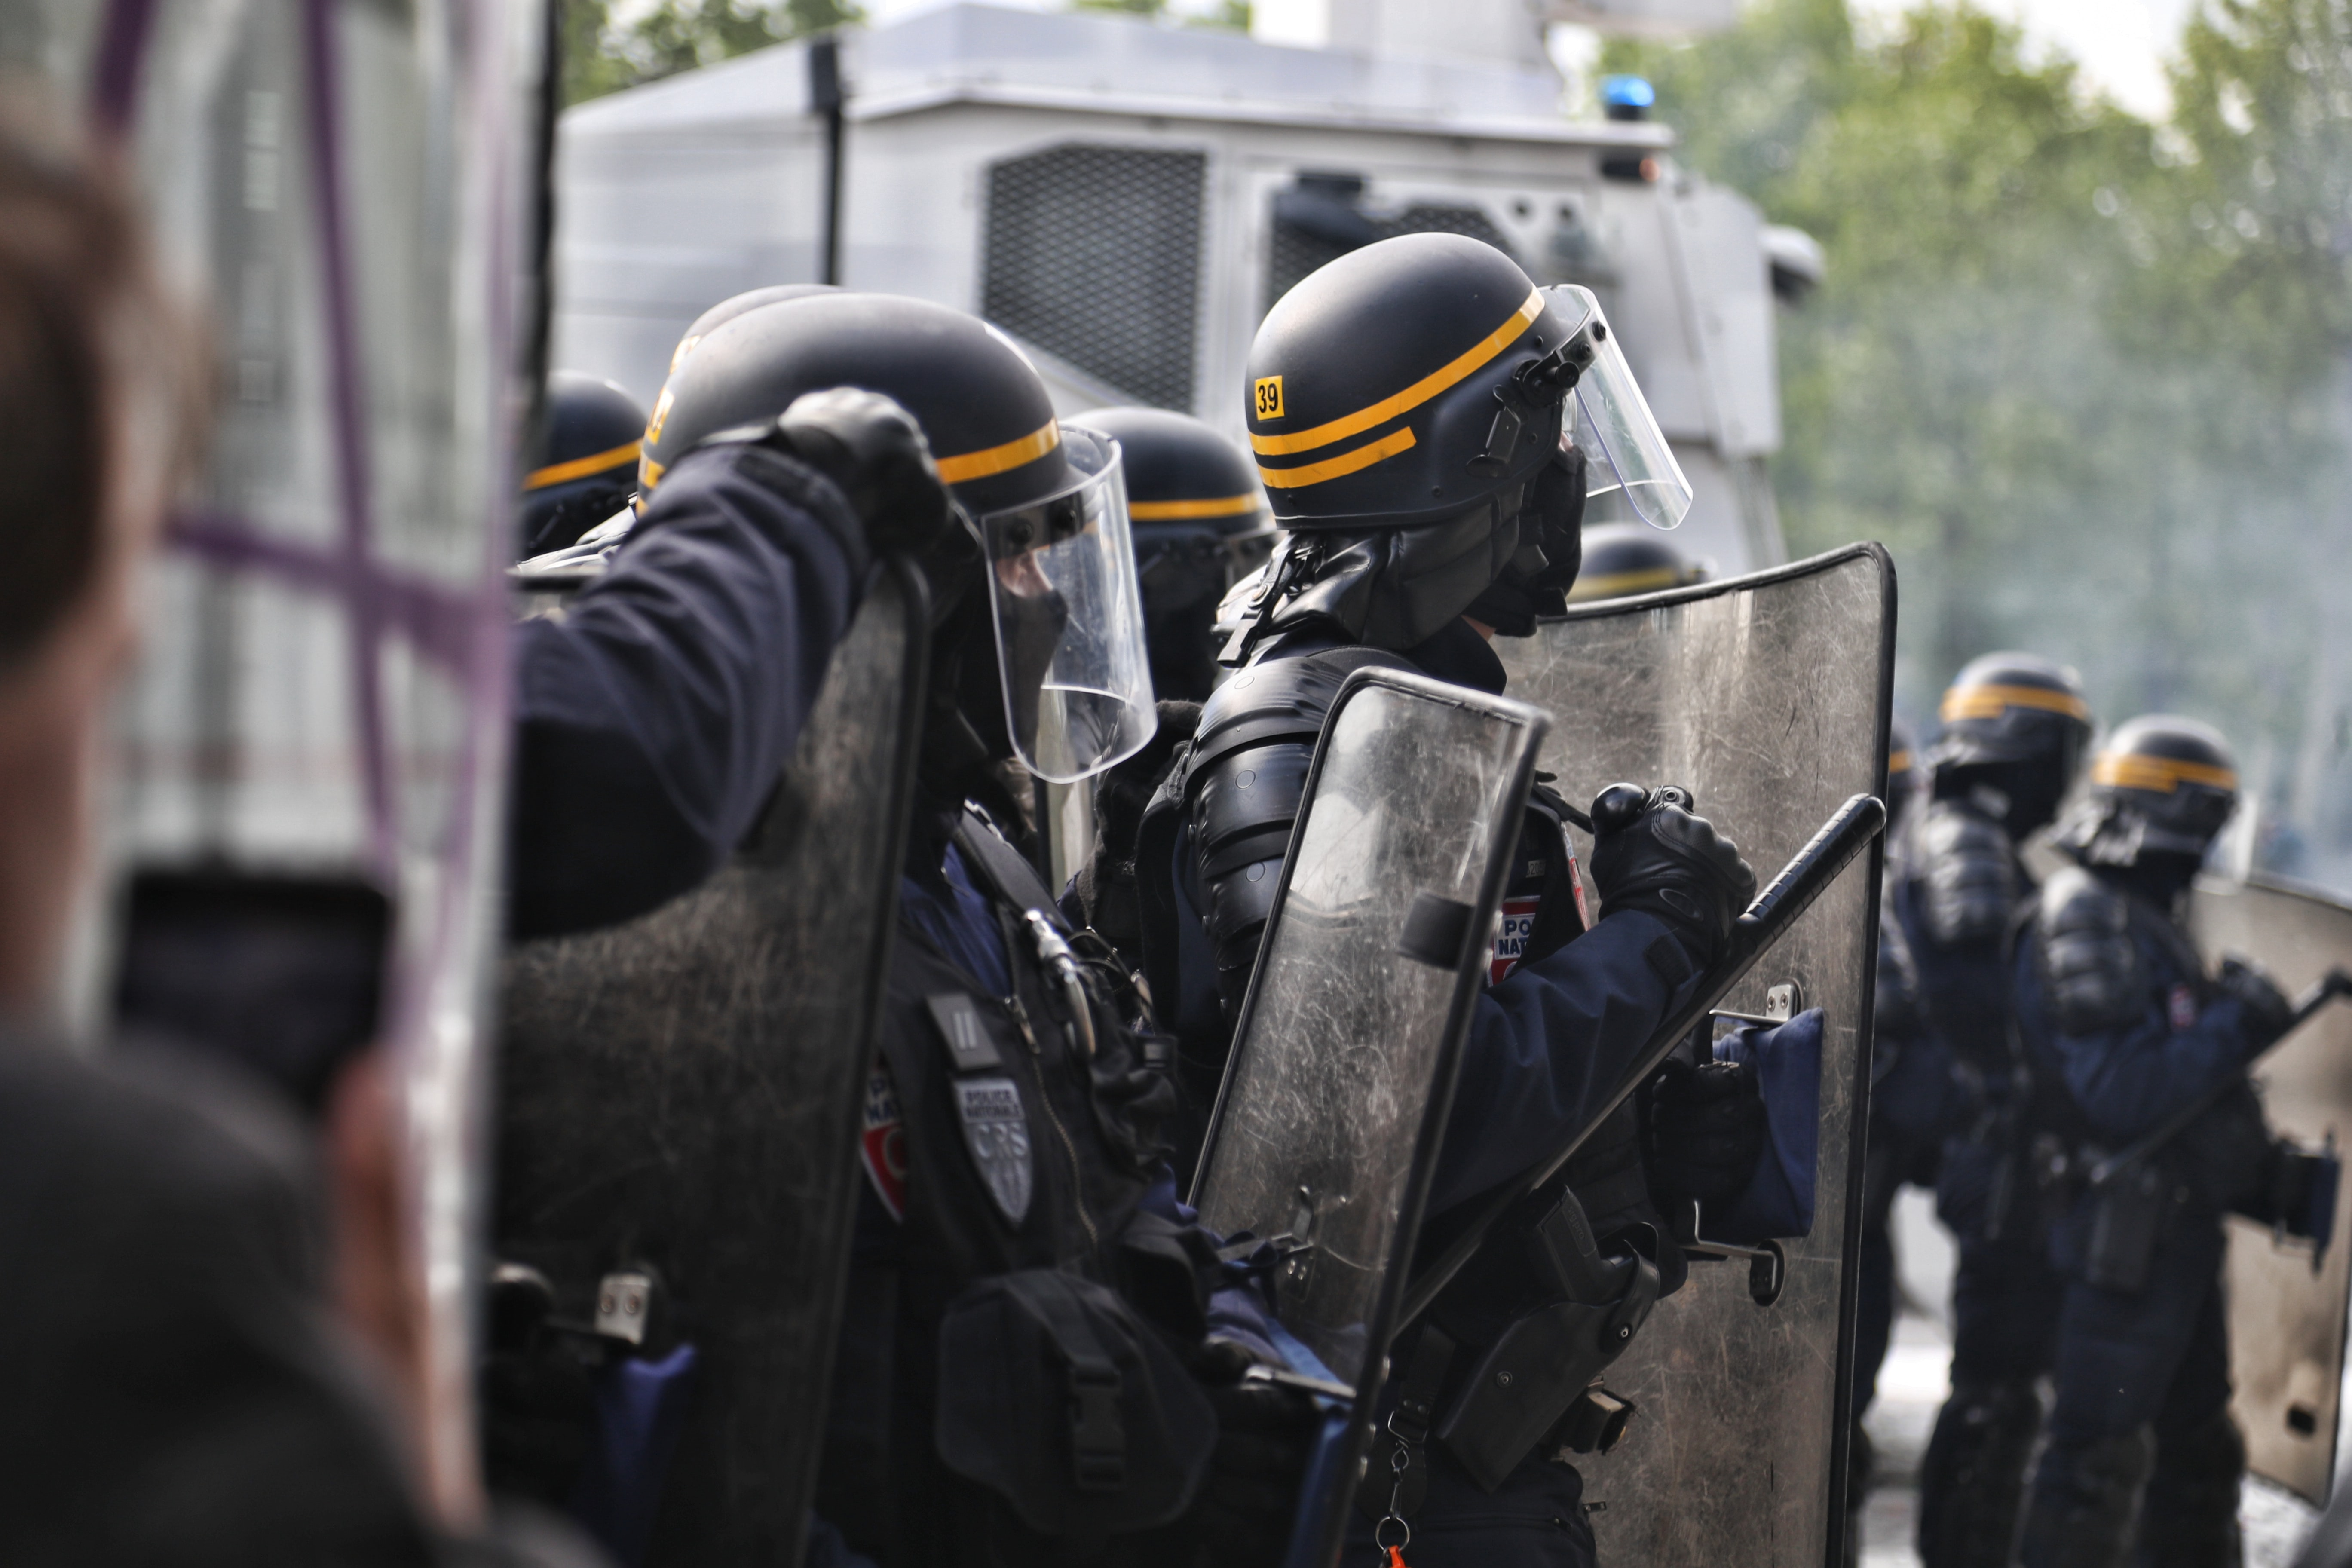 police wearing armors